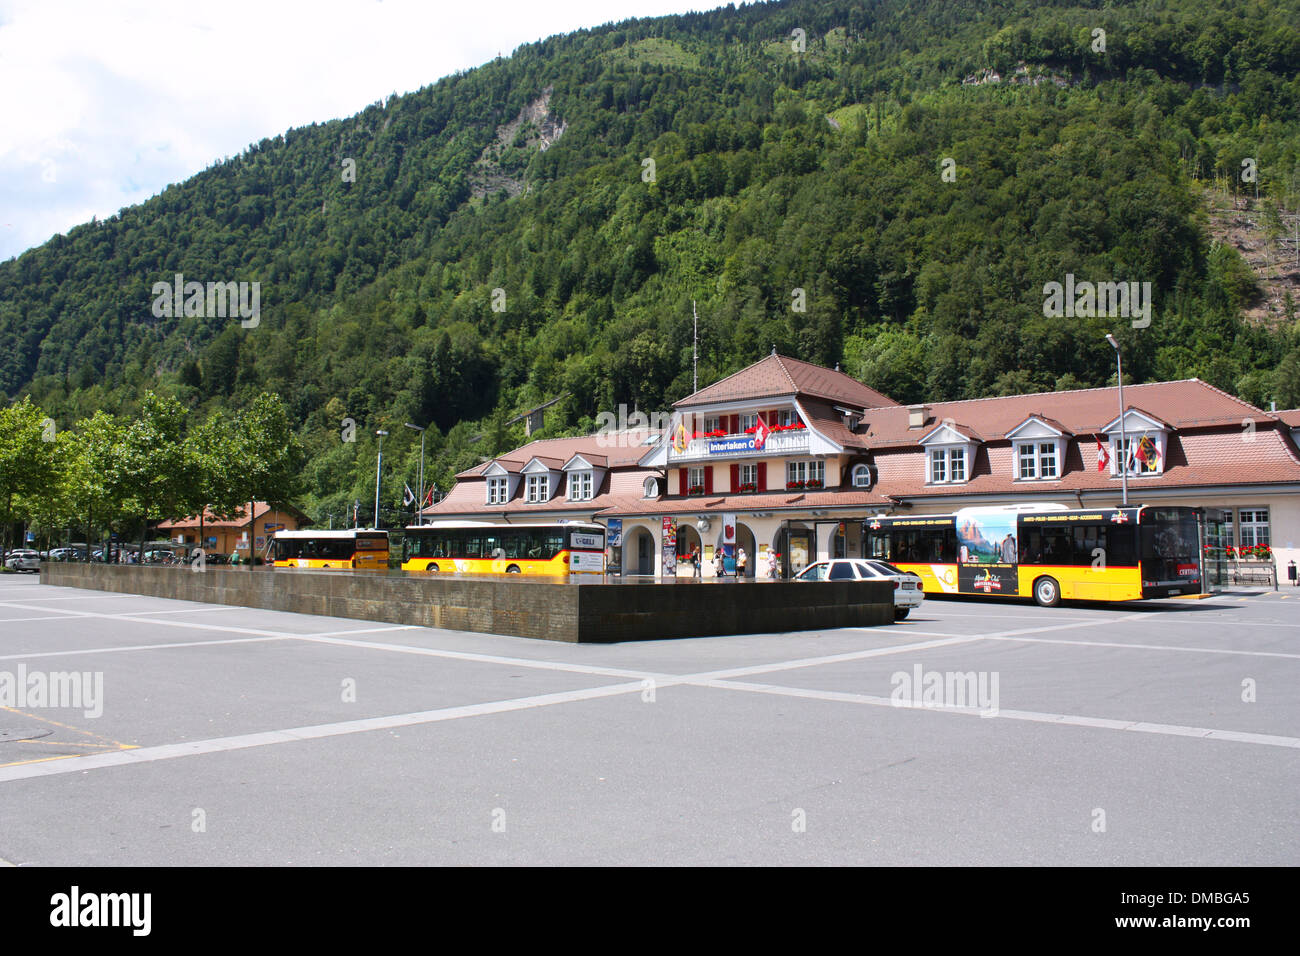 Interlaken Ost bus station in Switzerland - Stock Image